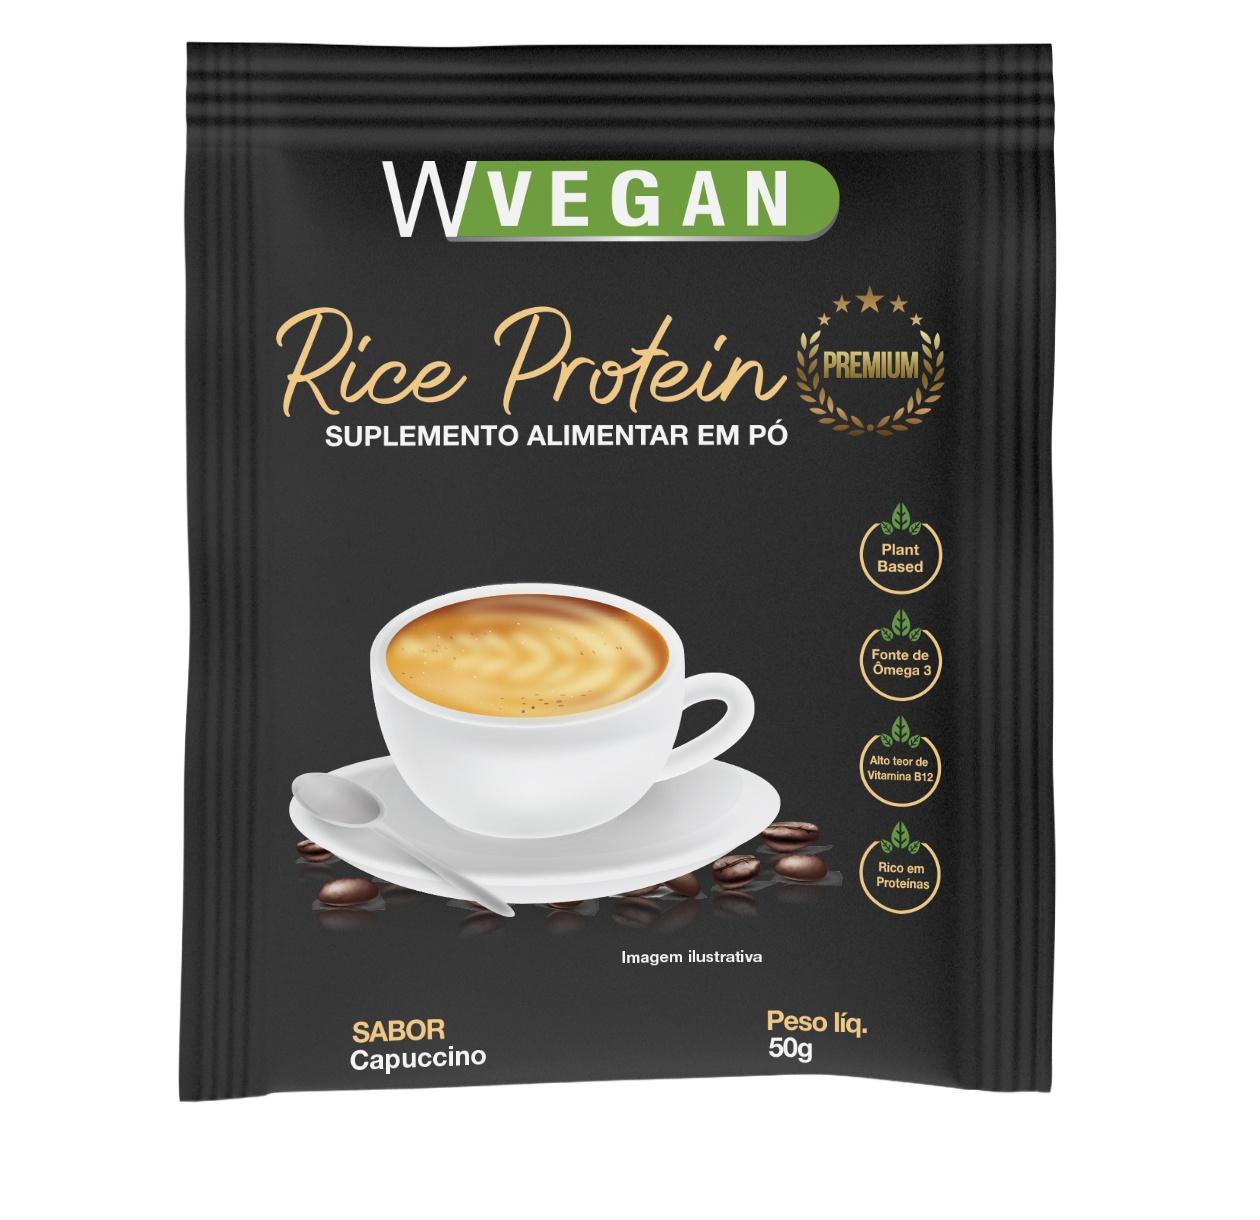 Rice Protein Premium 50g Sache Sabor Capuccino WVegan